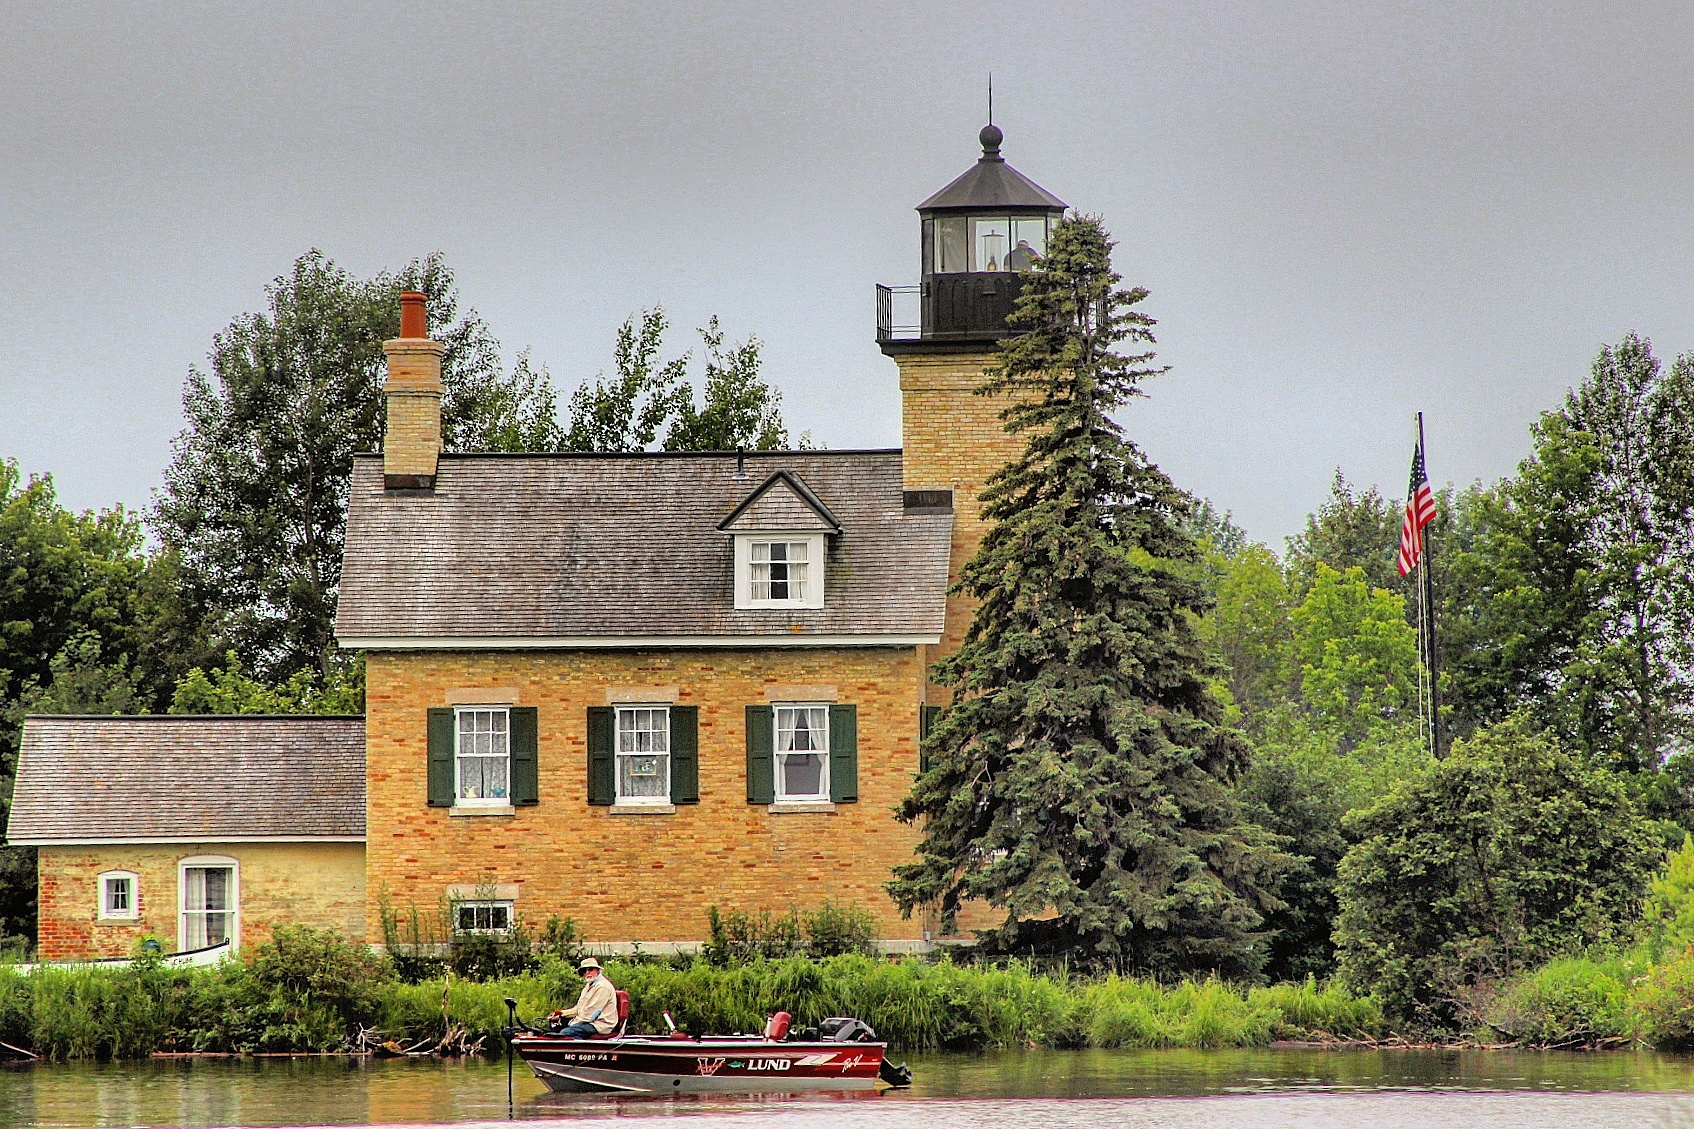 Ontonagan, Michigan lighthouse, local angler in foreground